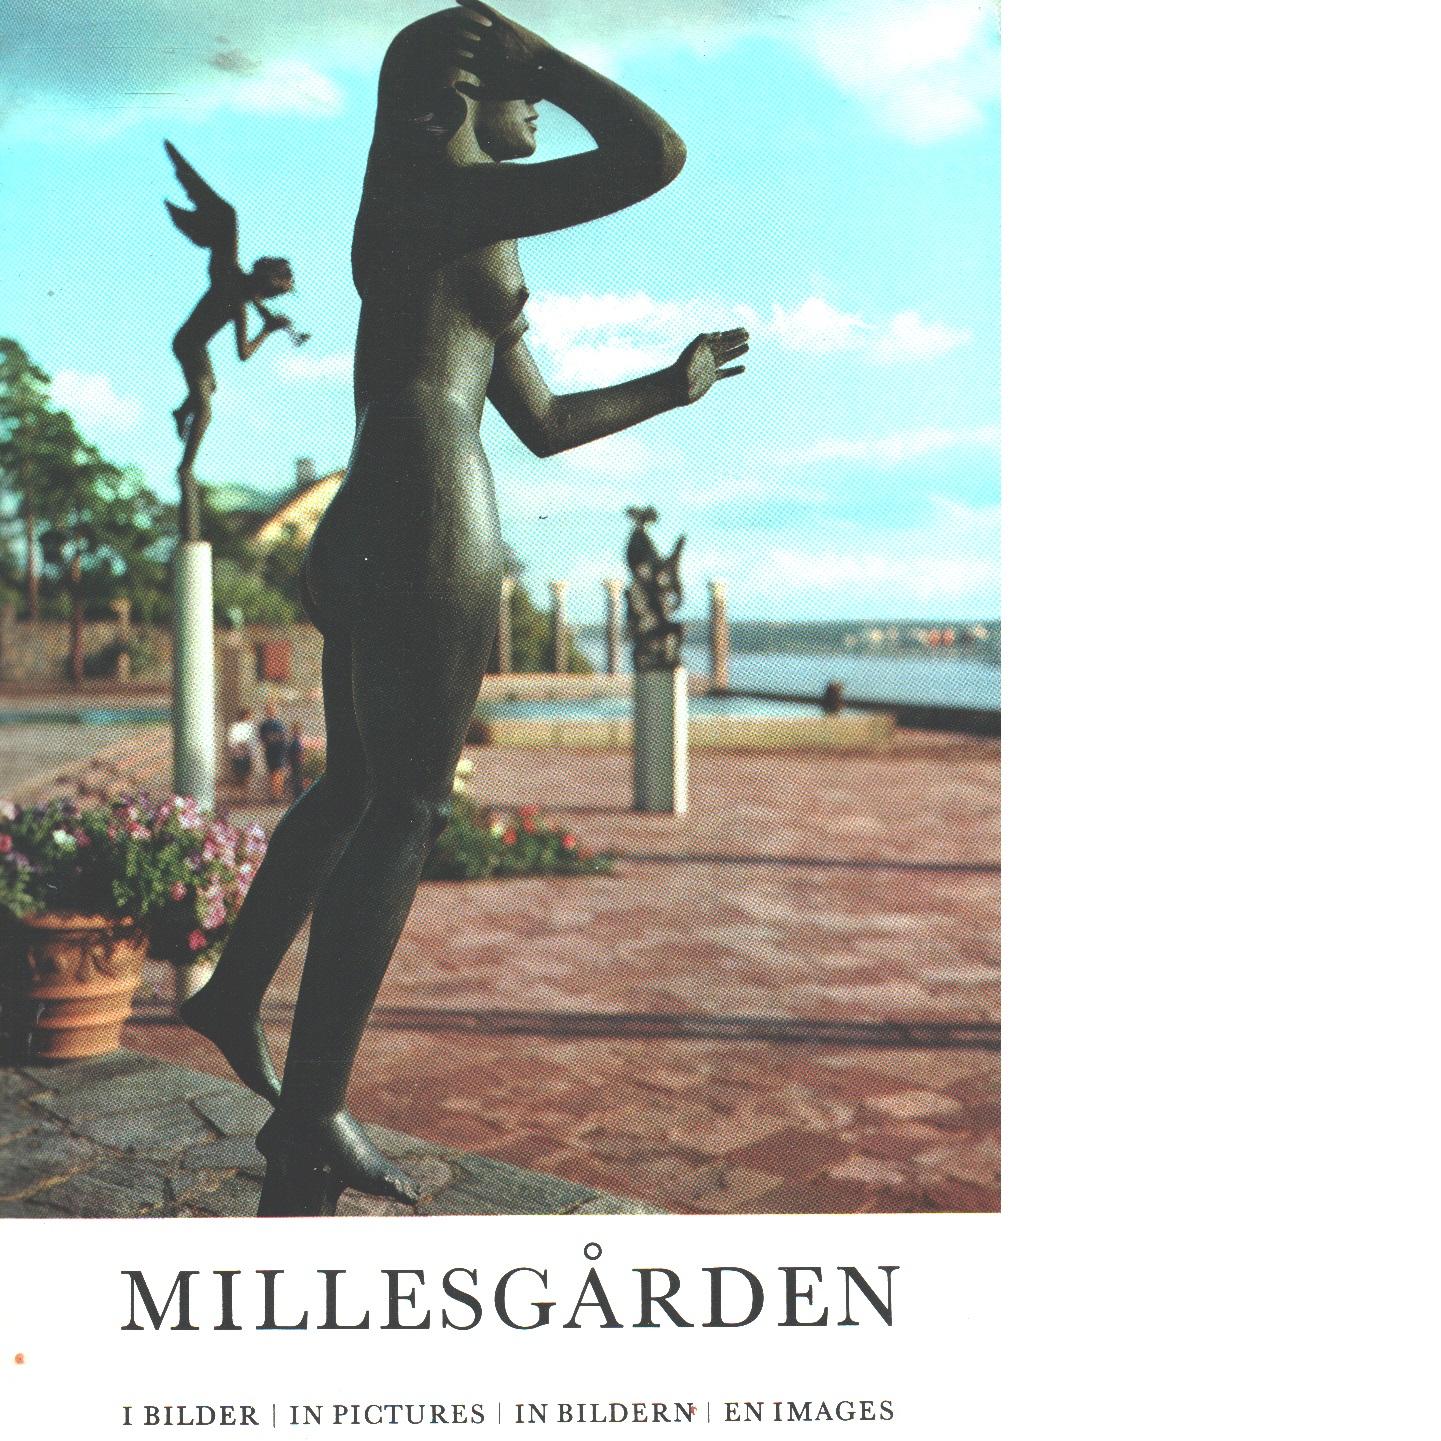 Millesgården i bilder - Arvidsson, Karl Axel